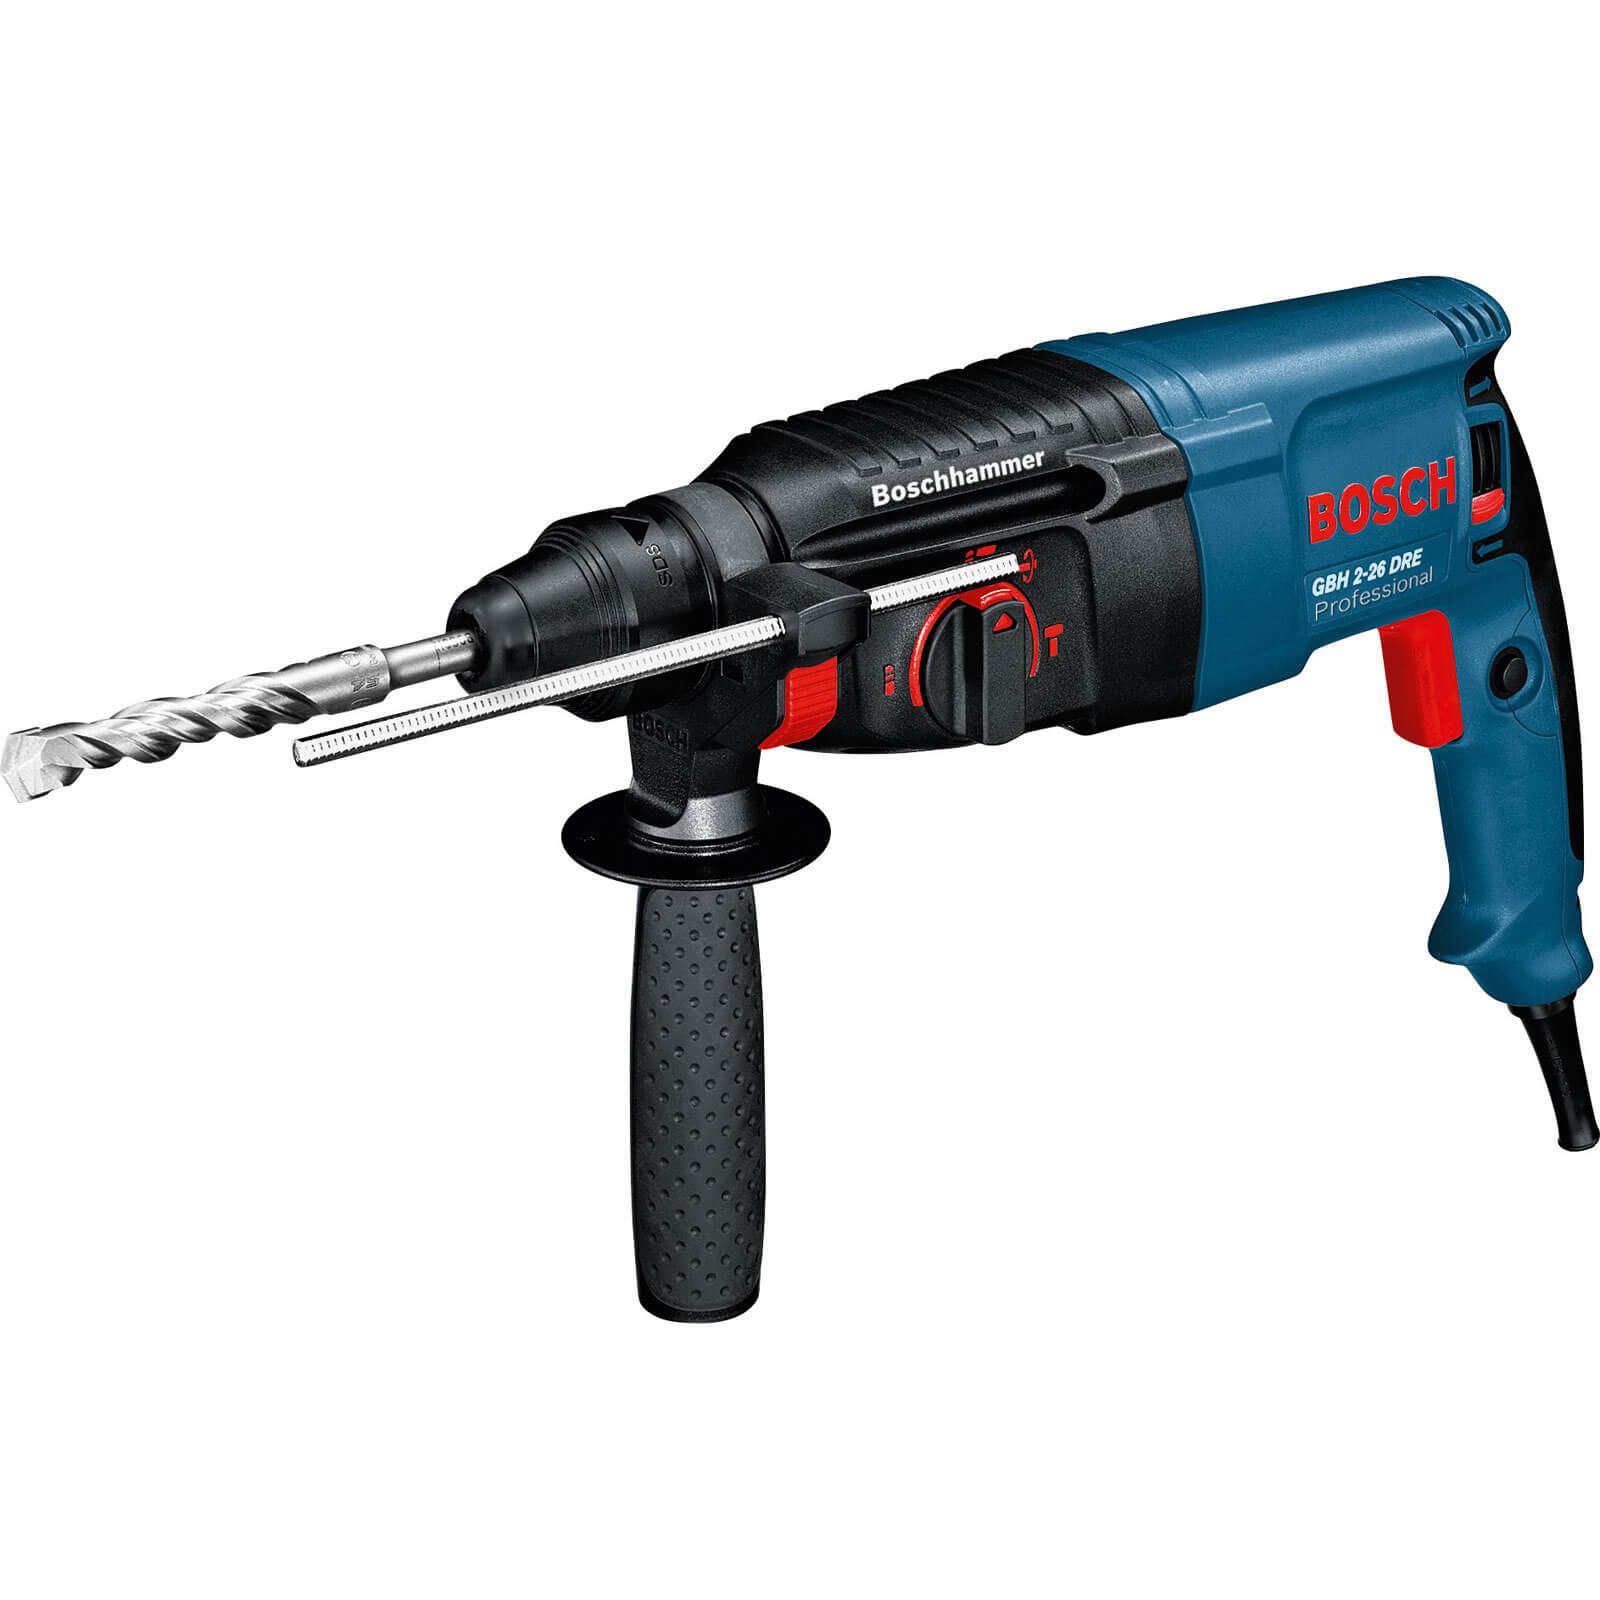 Bosch GBH 2 26 Dre 2Kg SDS Plus Hammer Drill 800w 110v